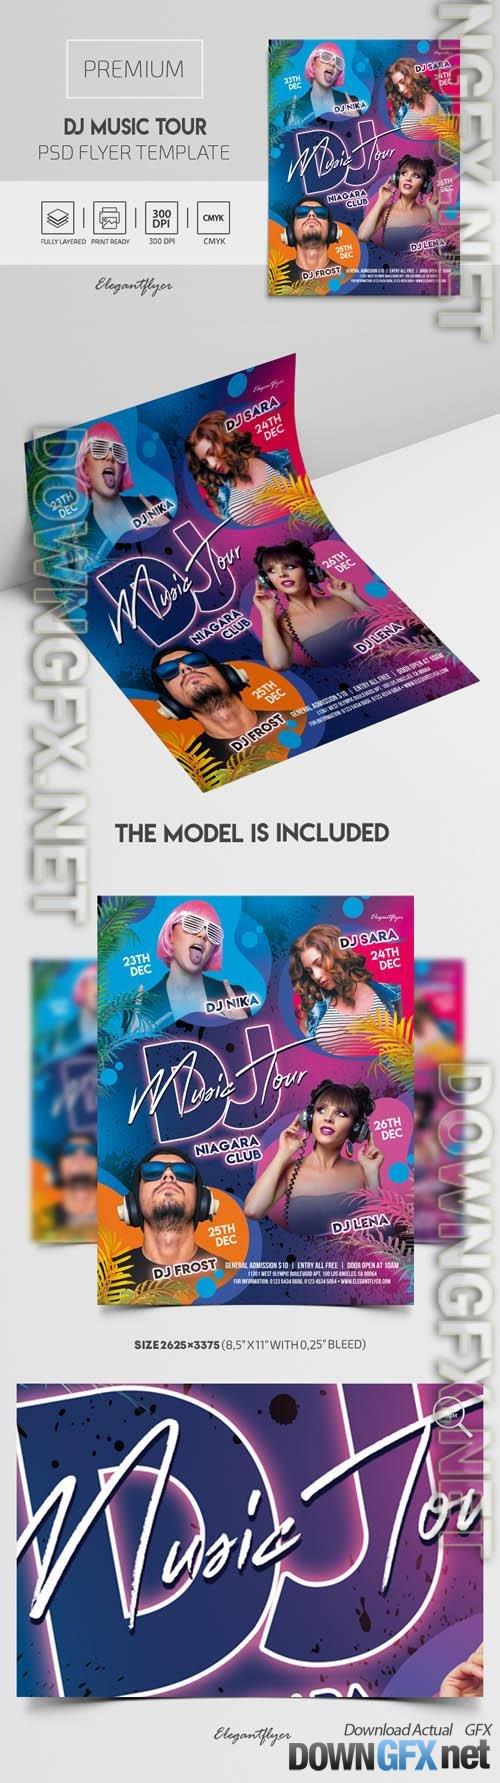 DJ Music Tour Premium PSD Flyer Template